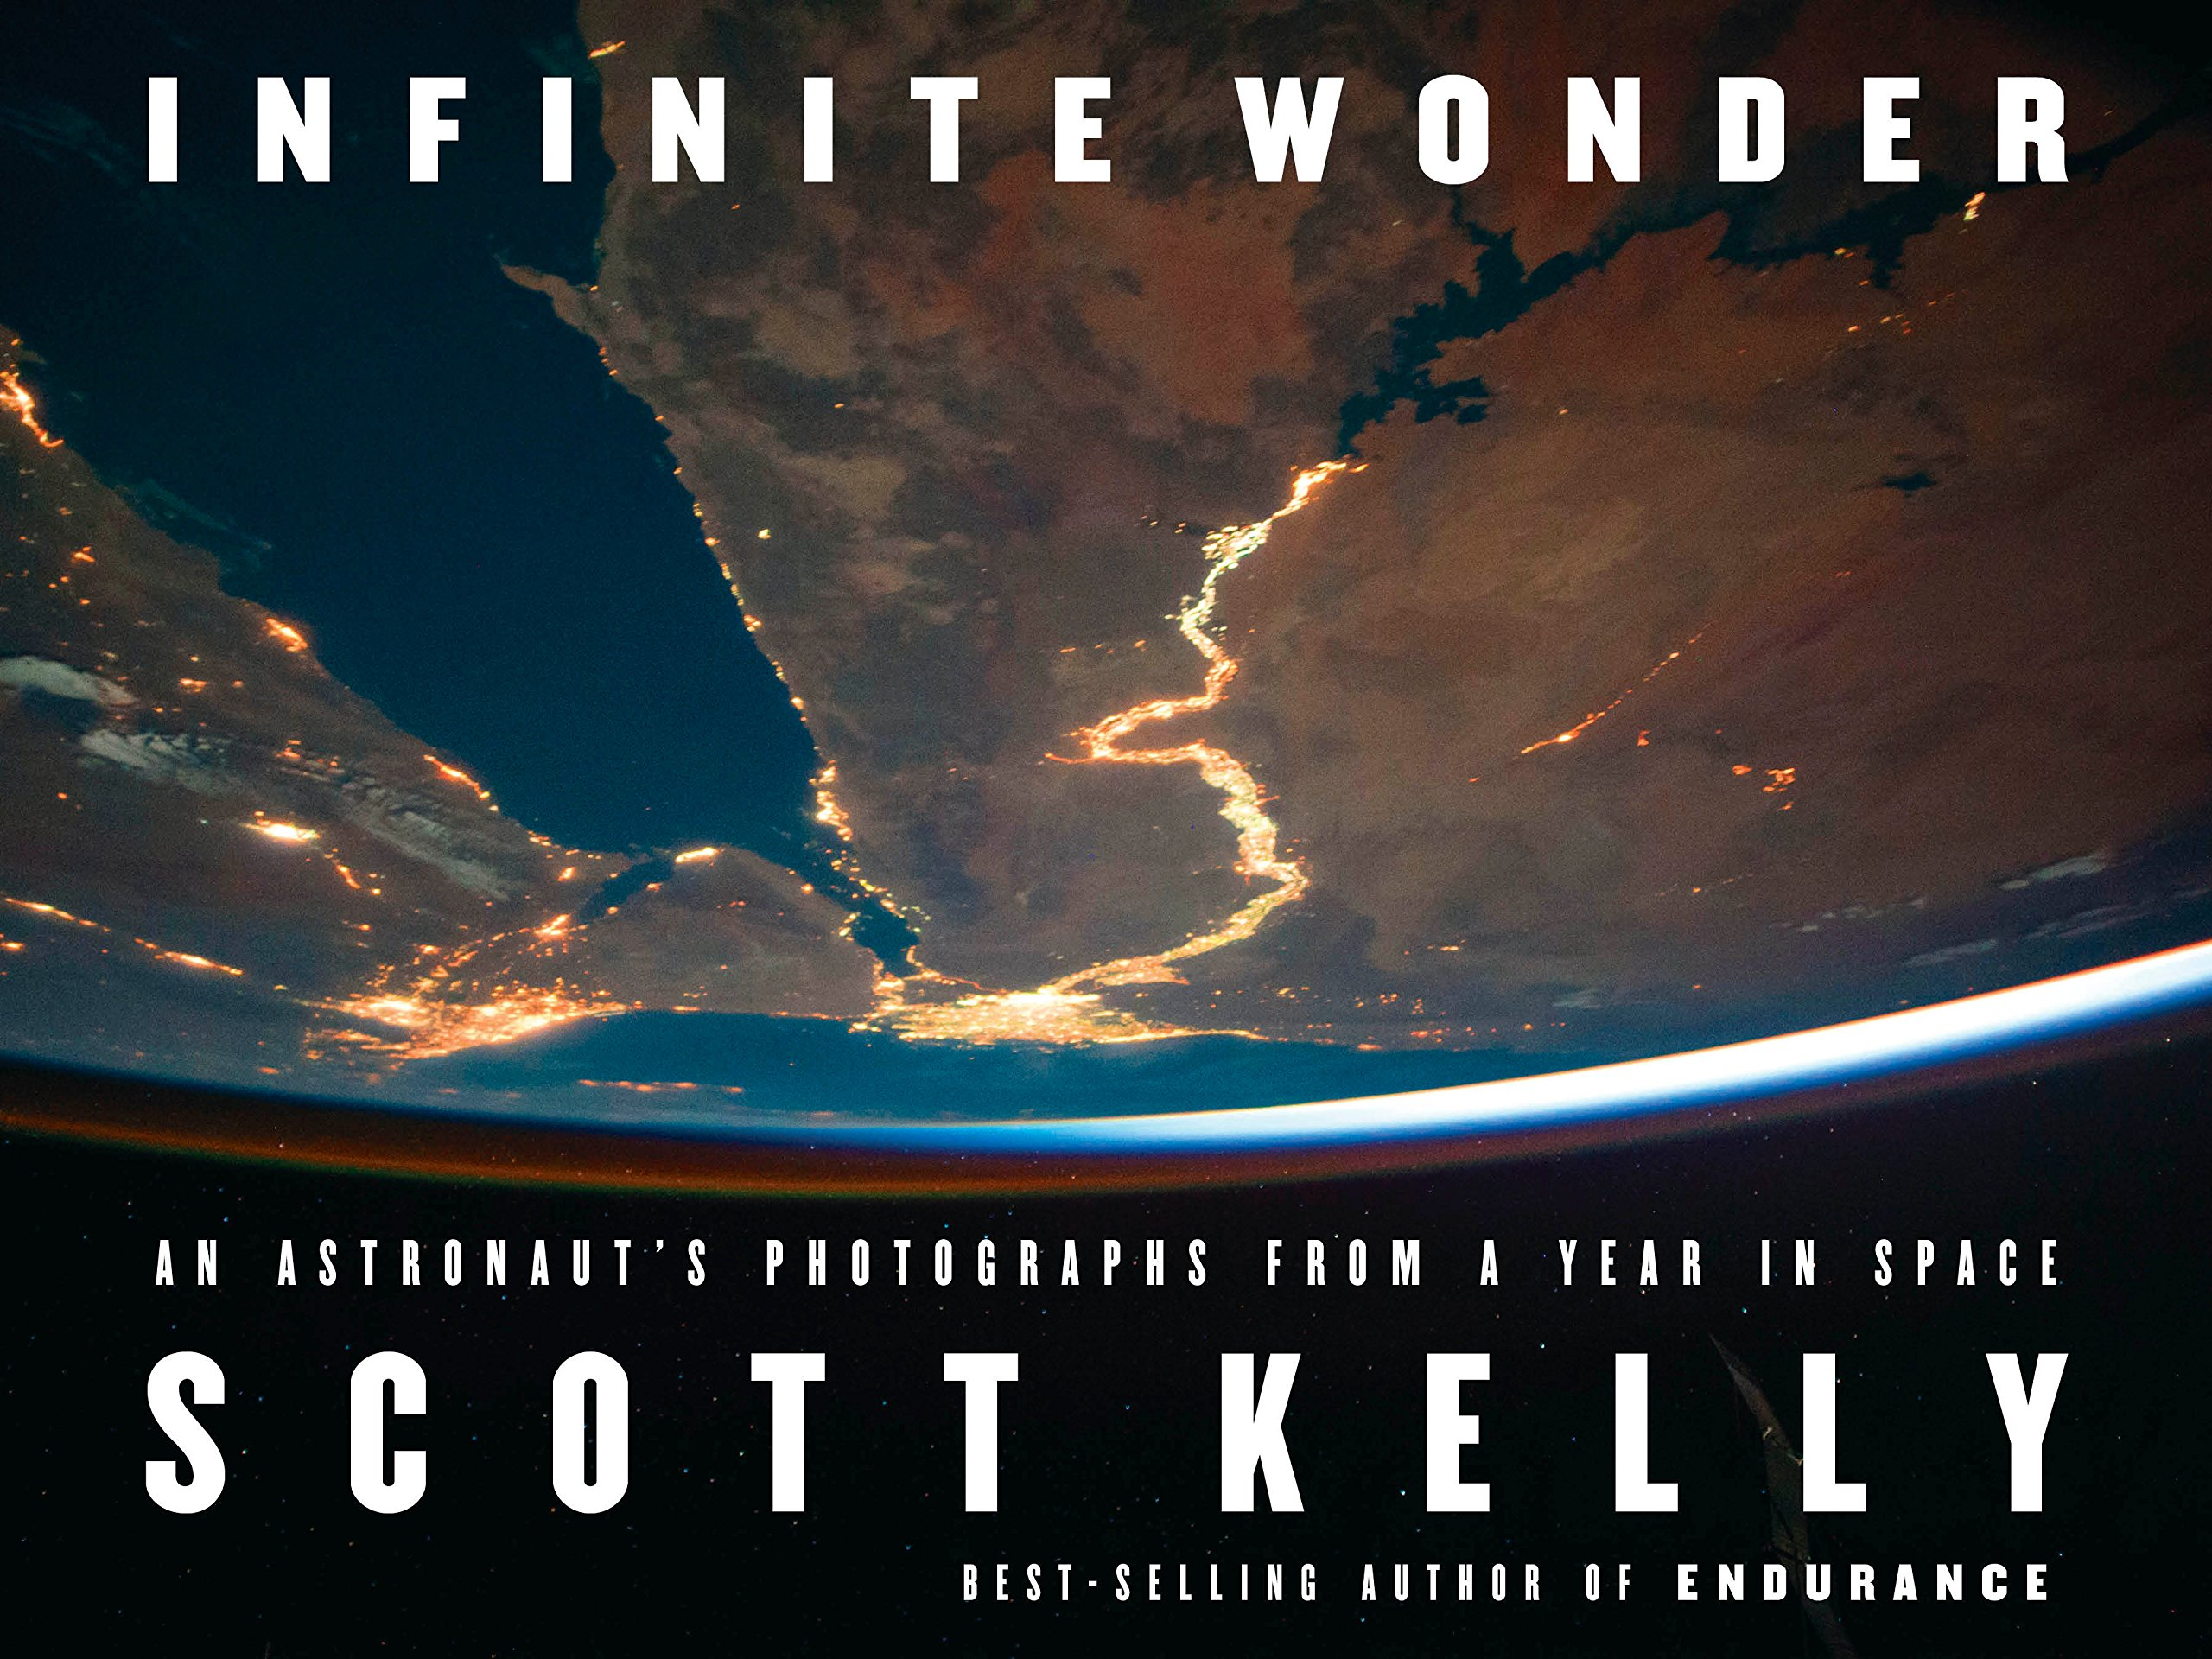 Infinite Wonder Astronauts Photographs Space product image